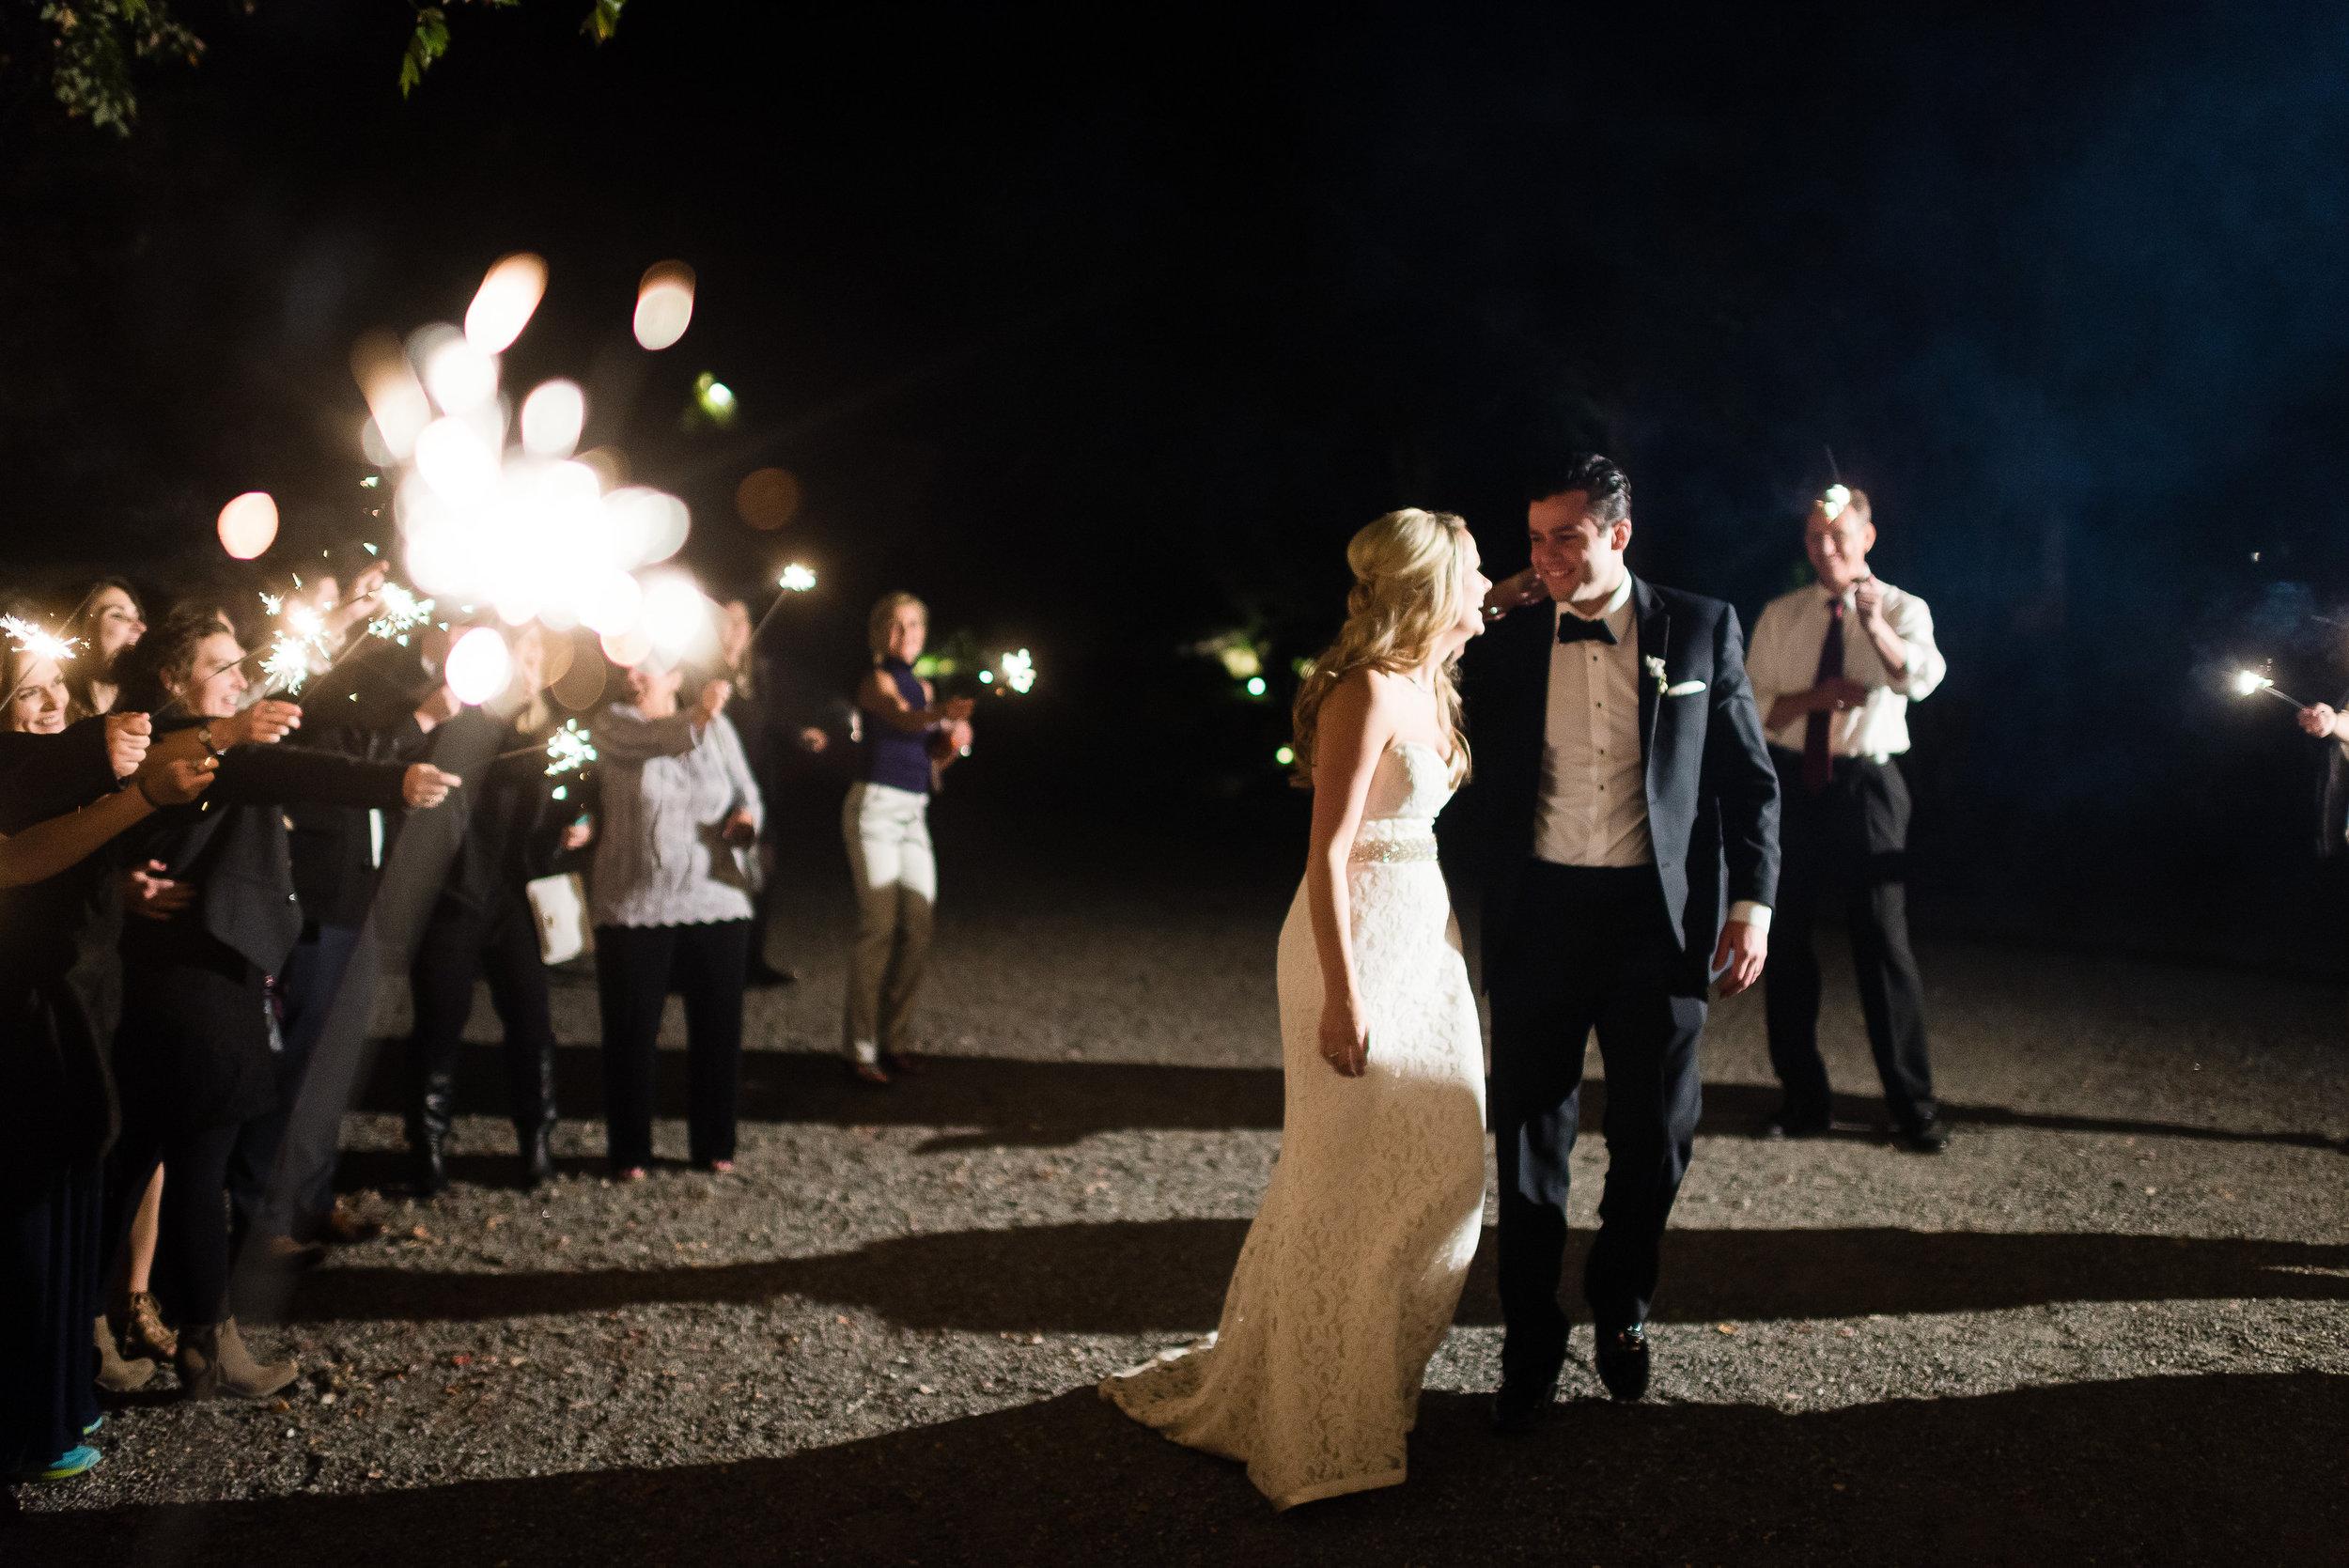 20161022_hawkesdene_fall_wedding_photos_2220.jpg